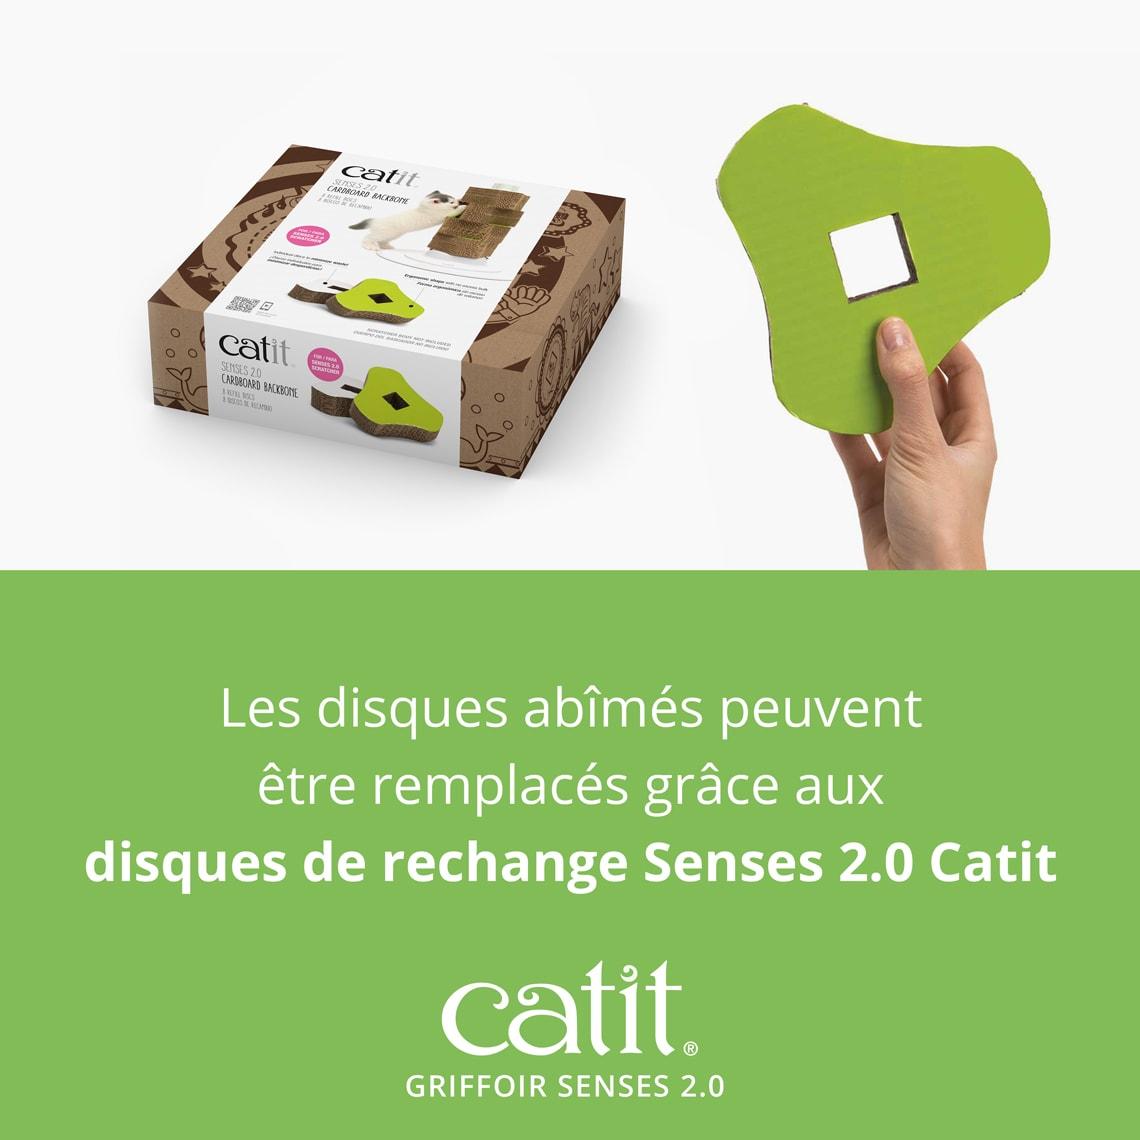 Griffoir Chat Carton Design griffoir senses 2.0